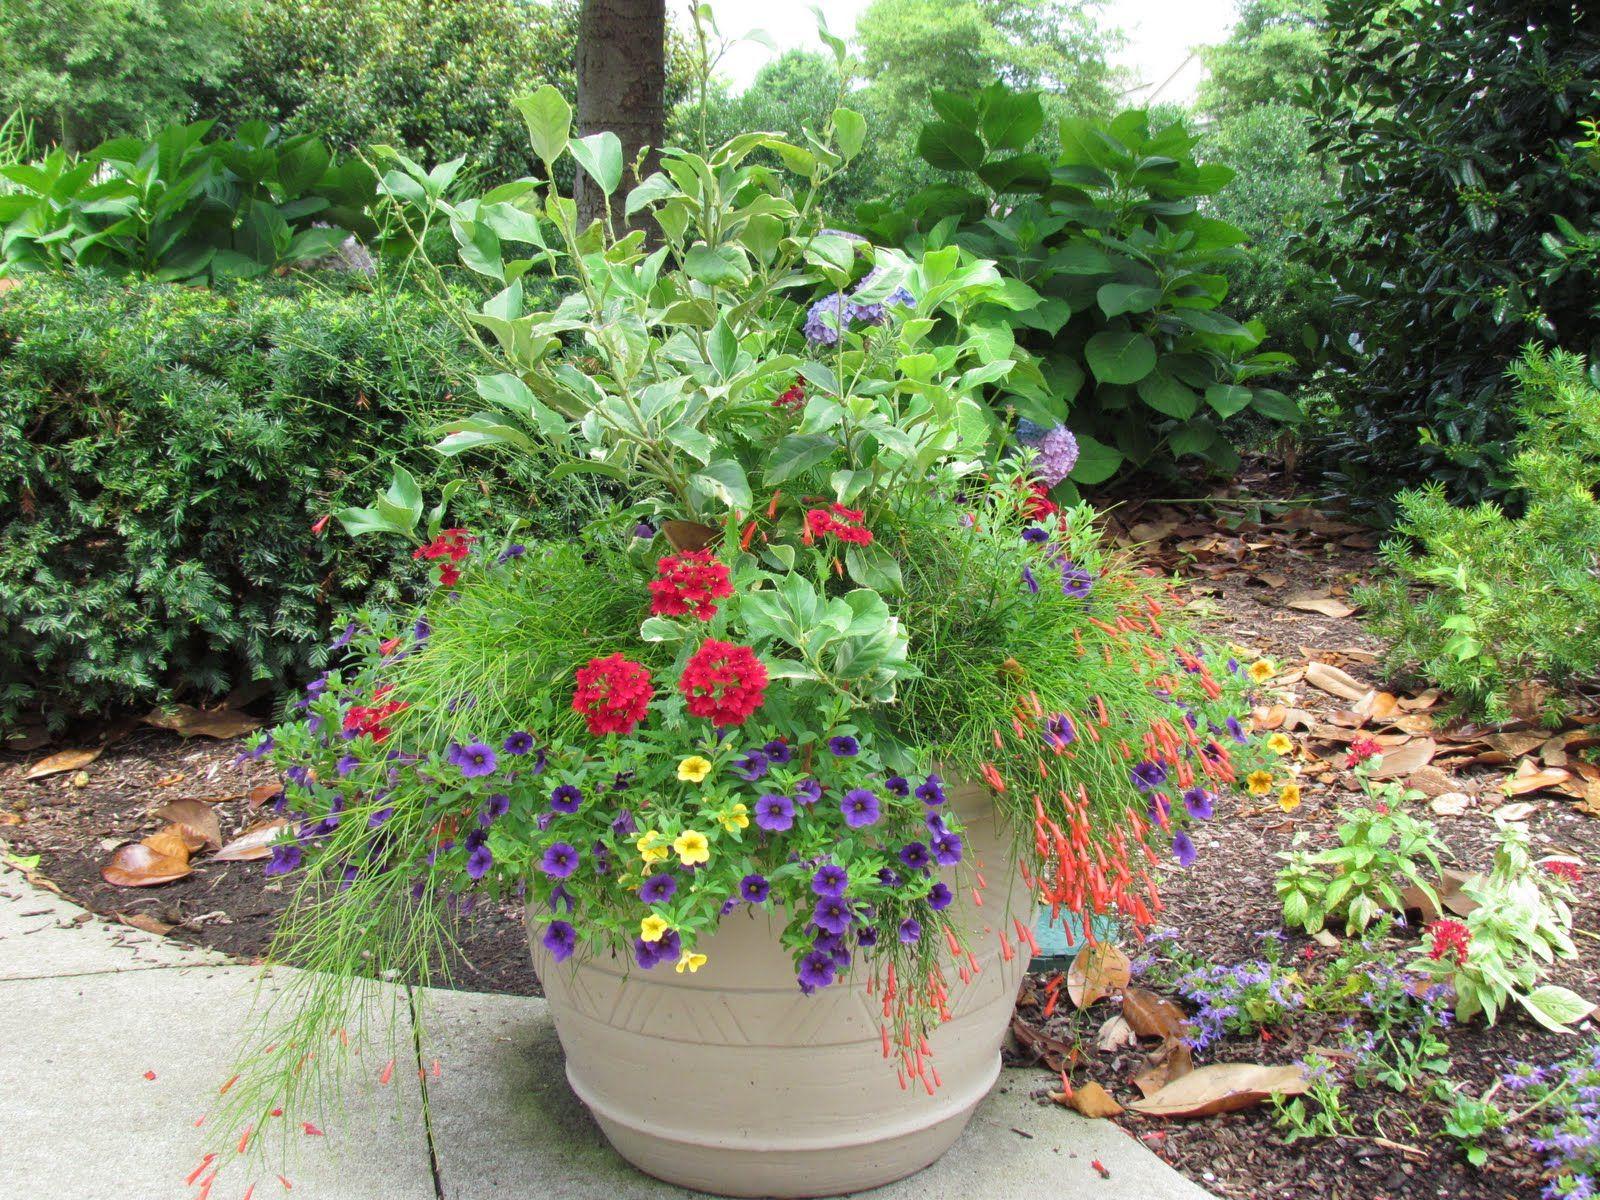 Good Bwisegardening: Container Gardening 365 Days Of Container Gardening